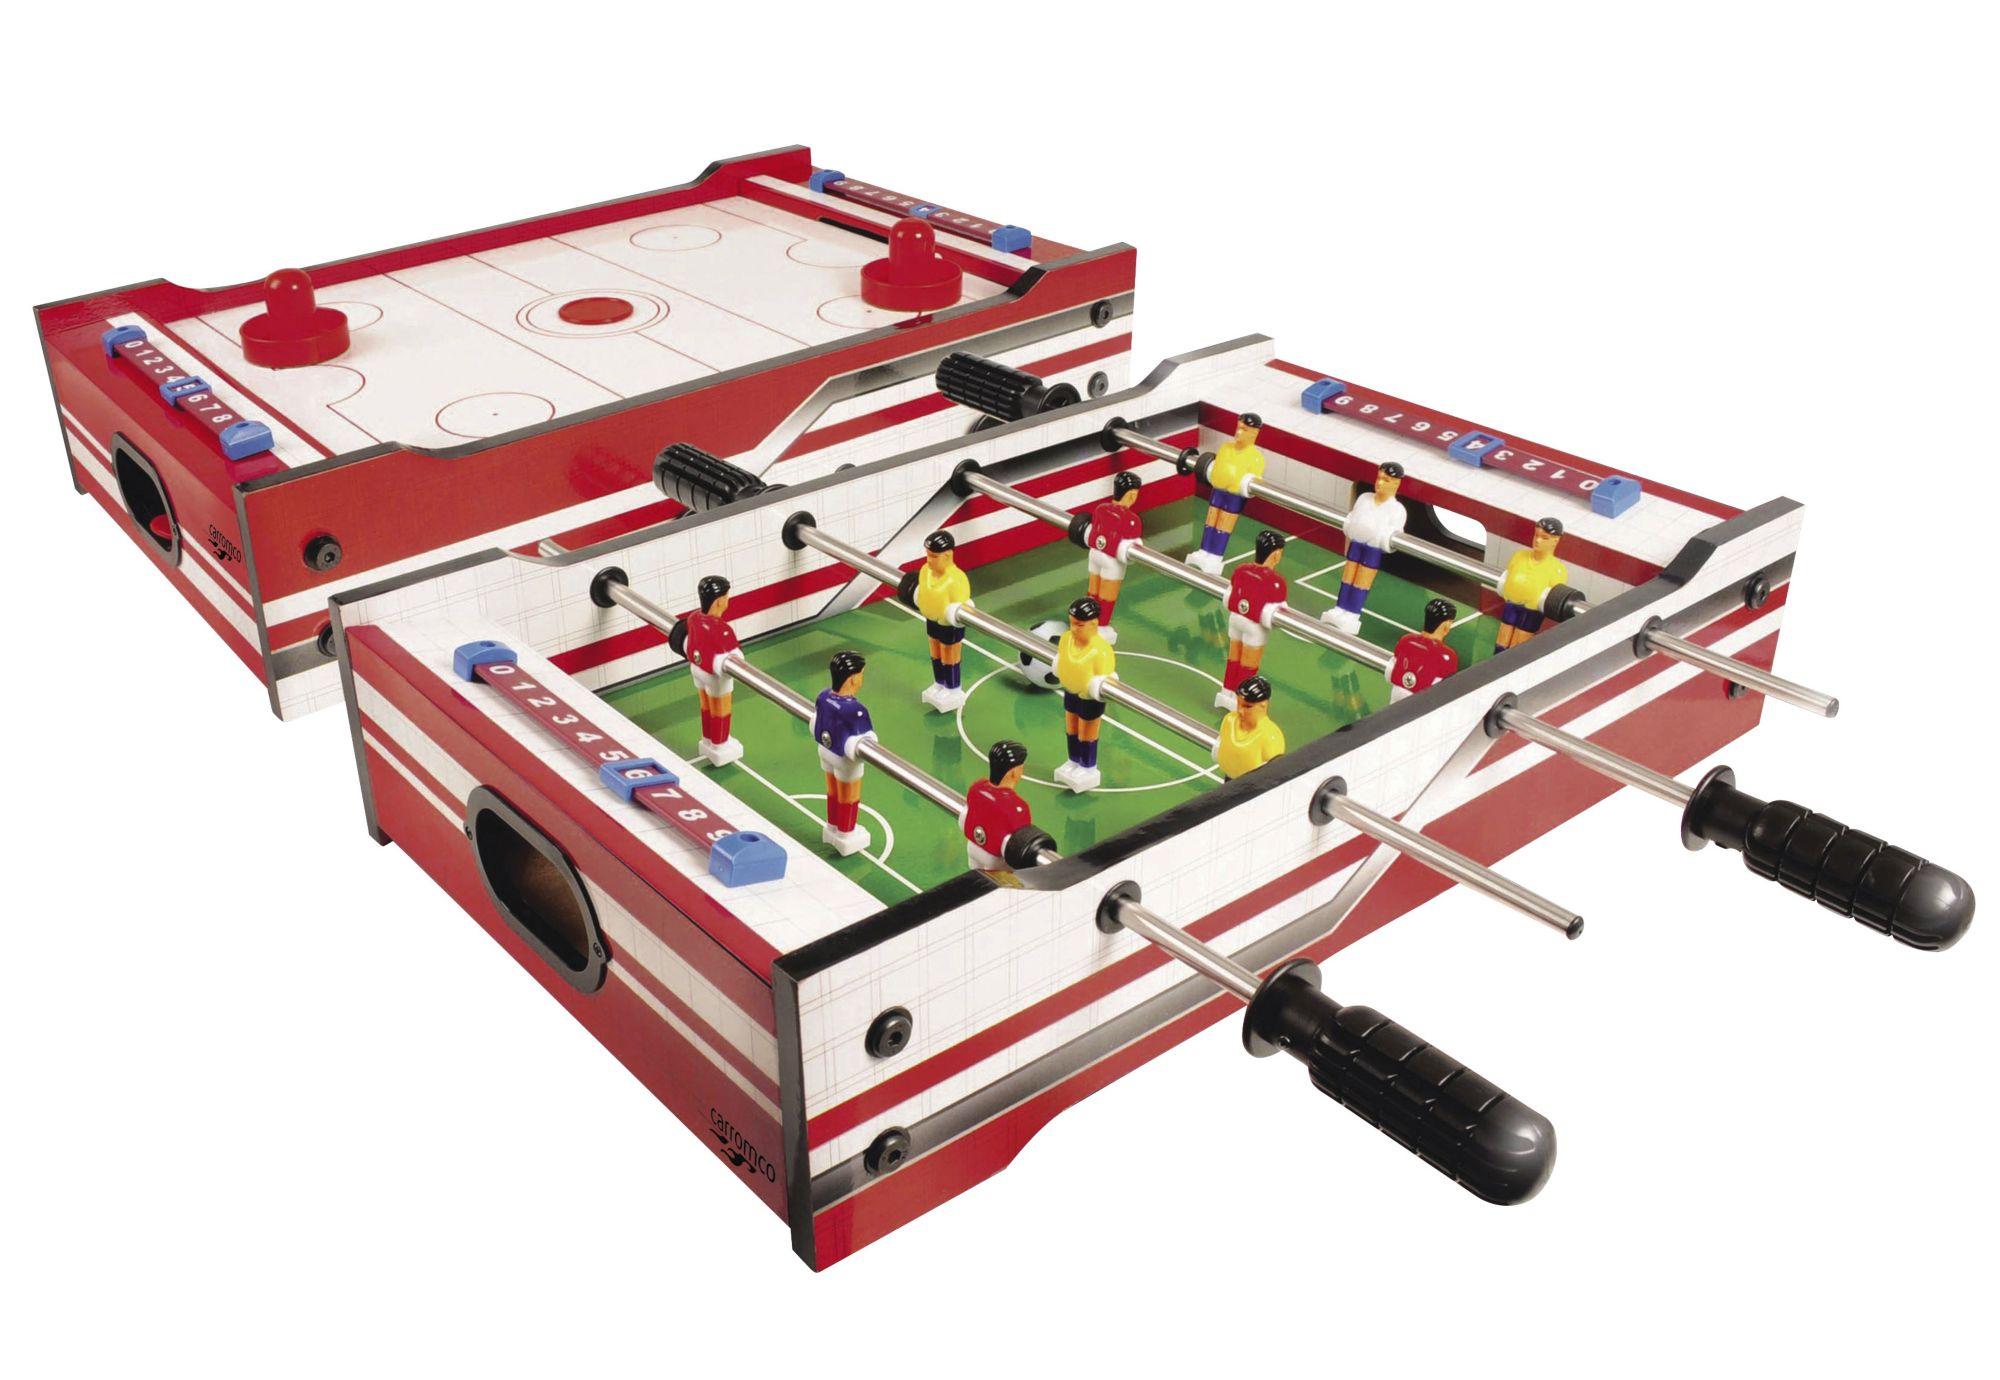 CARROMCO Carromco Multi-Spiel 2in1, »MultiSpiel FLIP-XM«